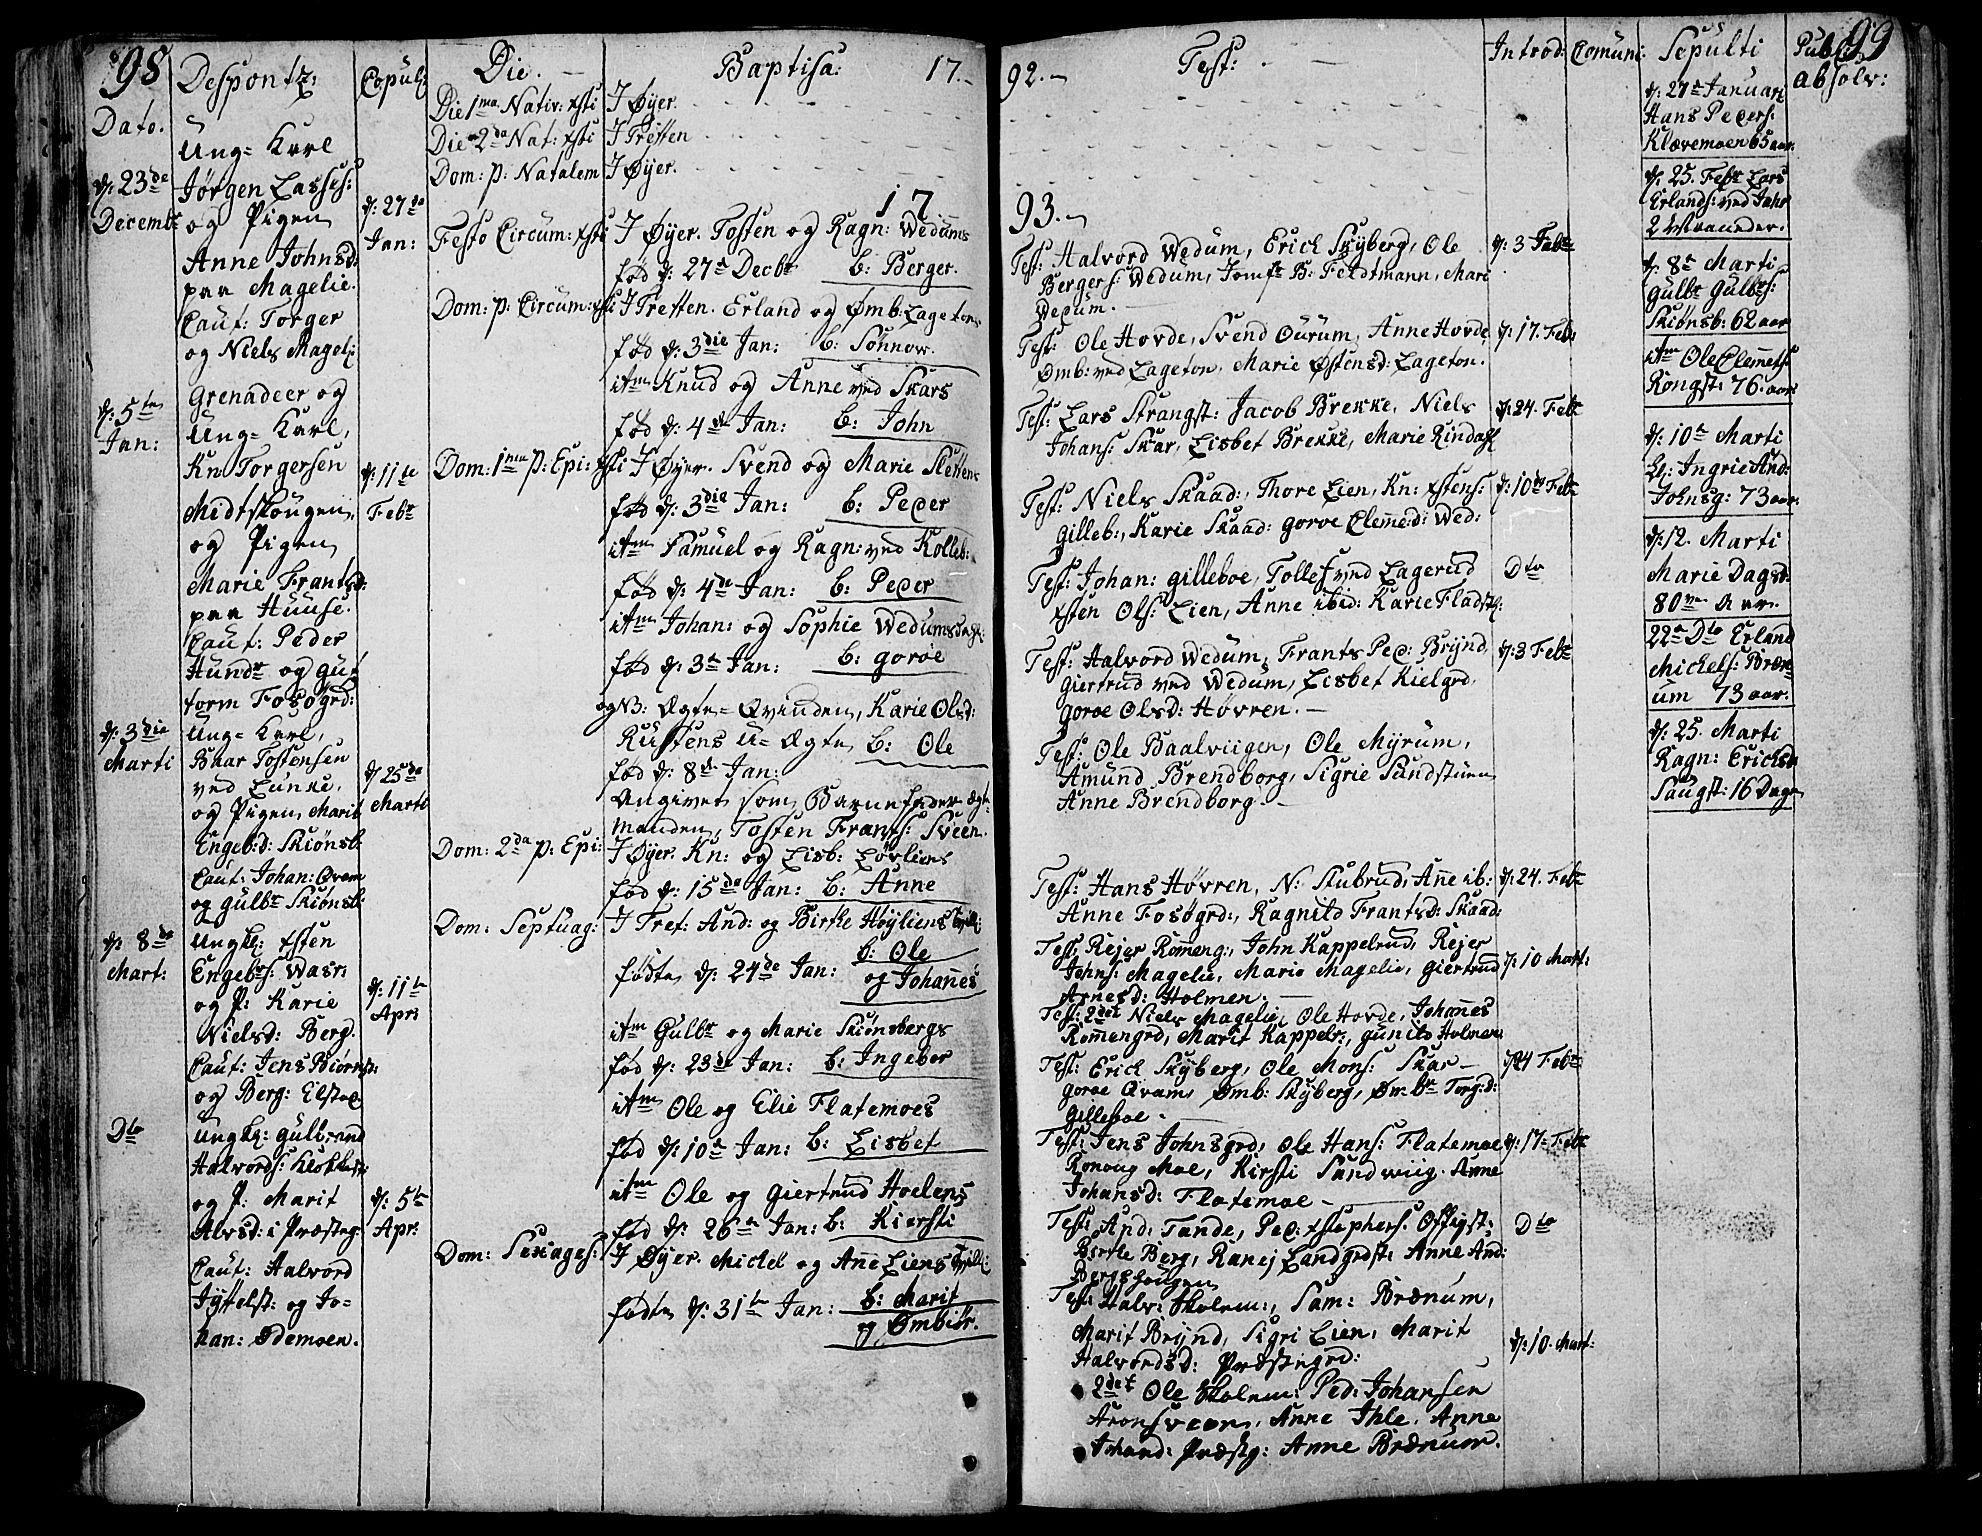 SAH, Øyer prestekontor, Ministerialbok nr. 3, 1784-1824, s. 98-99